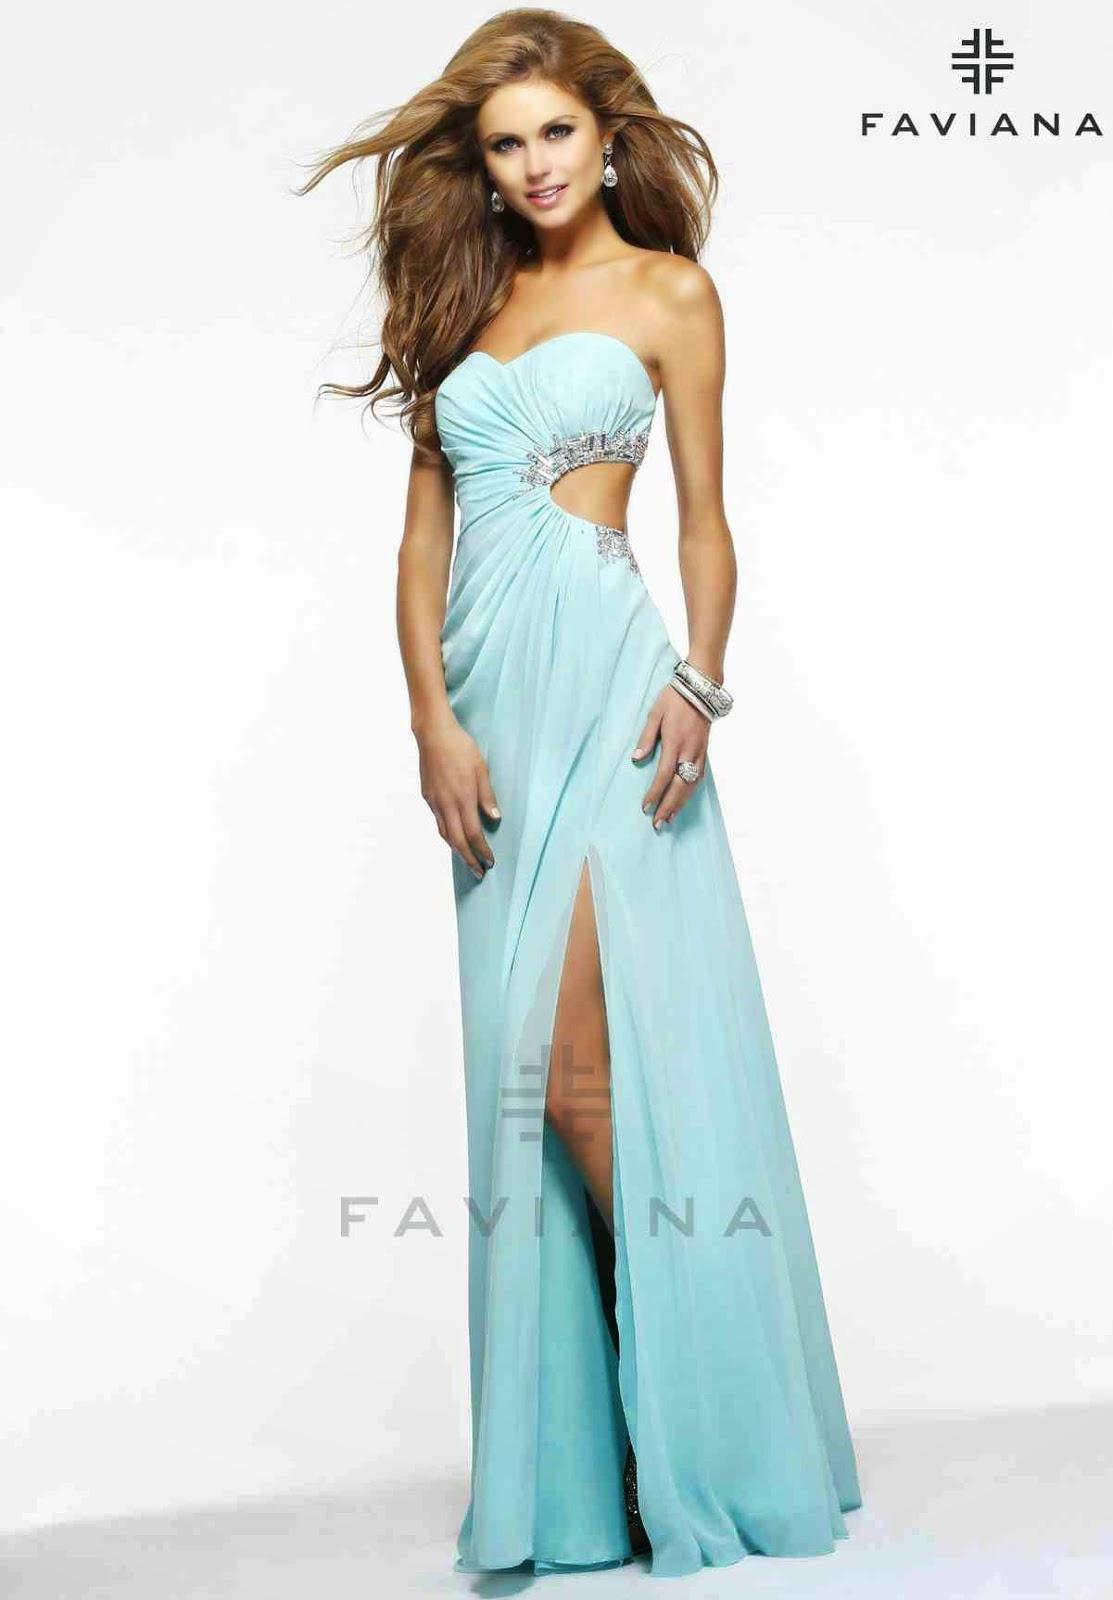 Moda para seoritas  Hermosos Vestidos de fiesta 2015